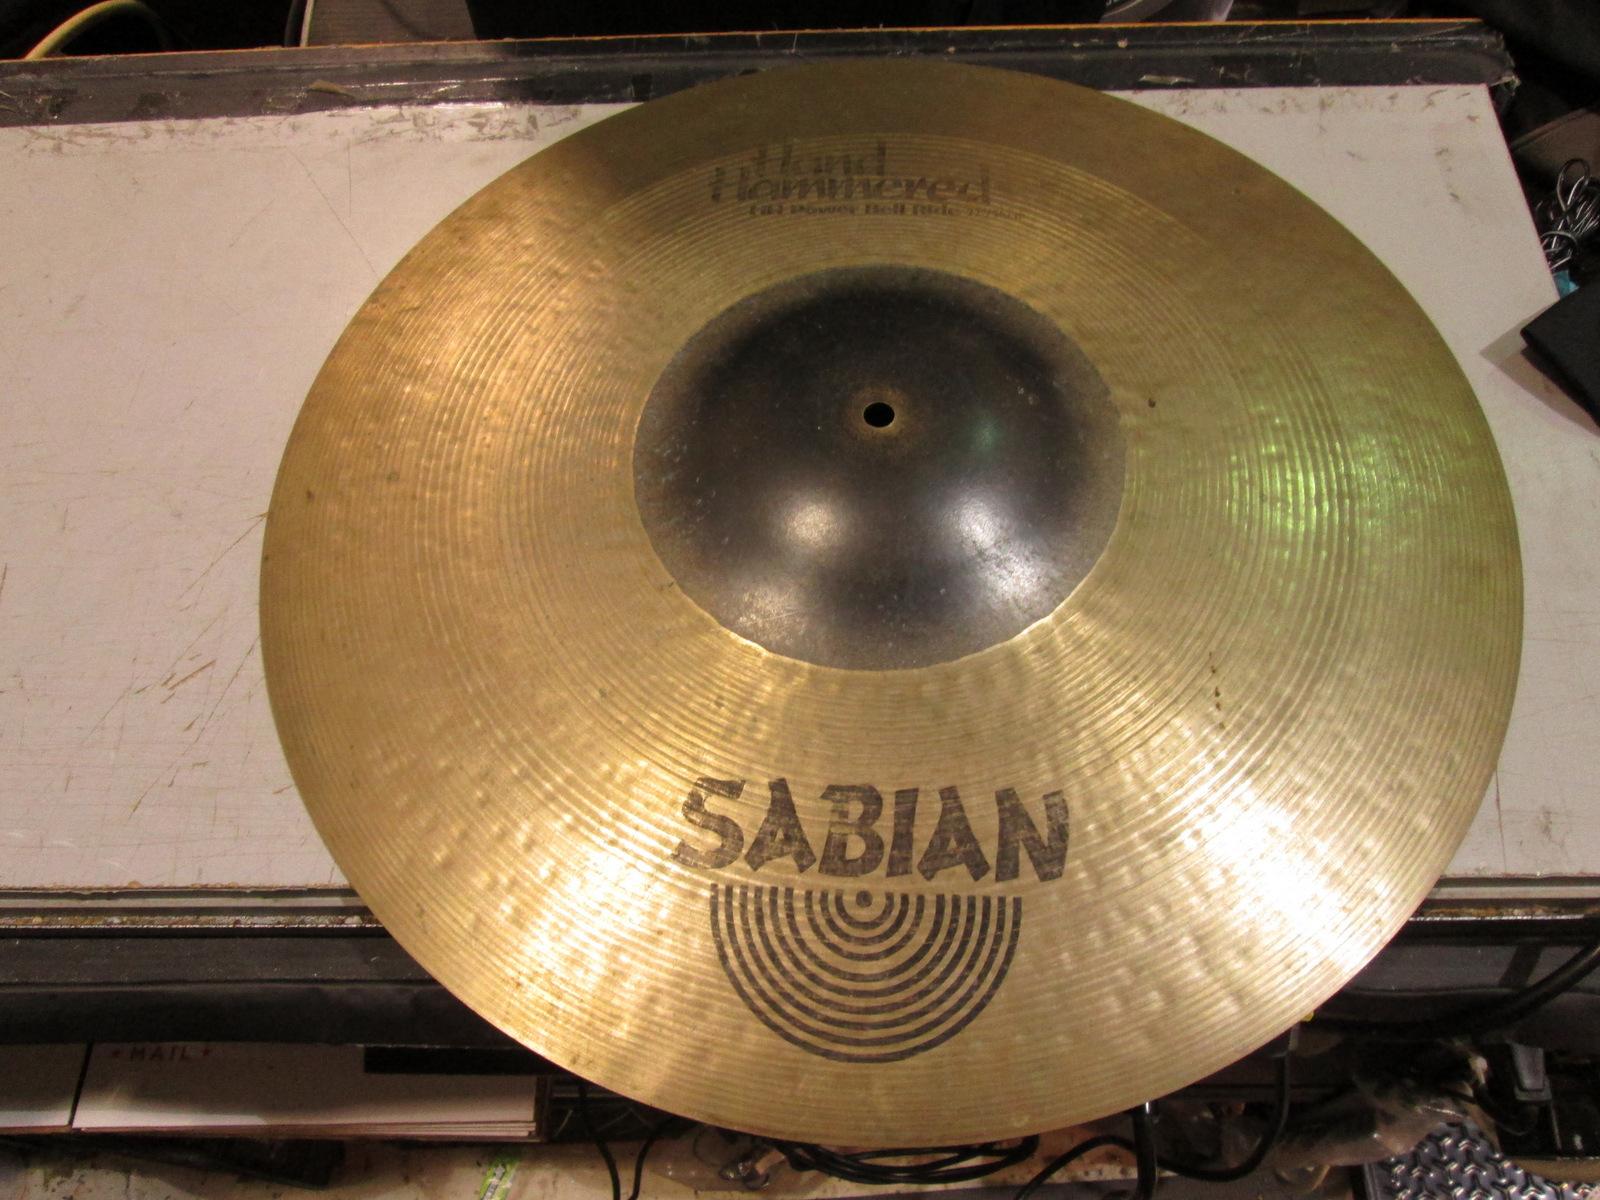 SABIAN HH POWERBELL RIDE 22